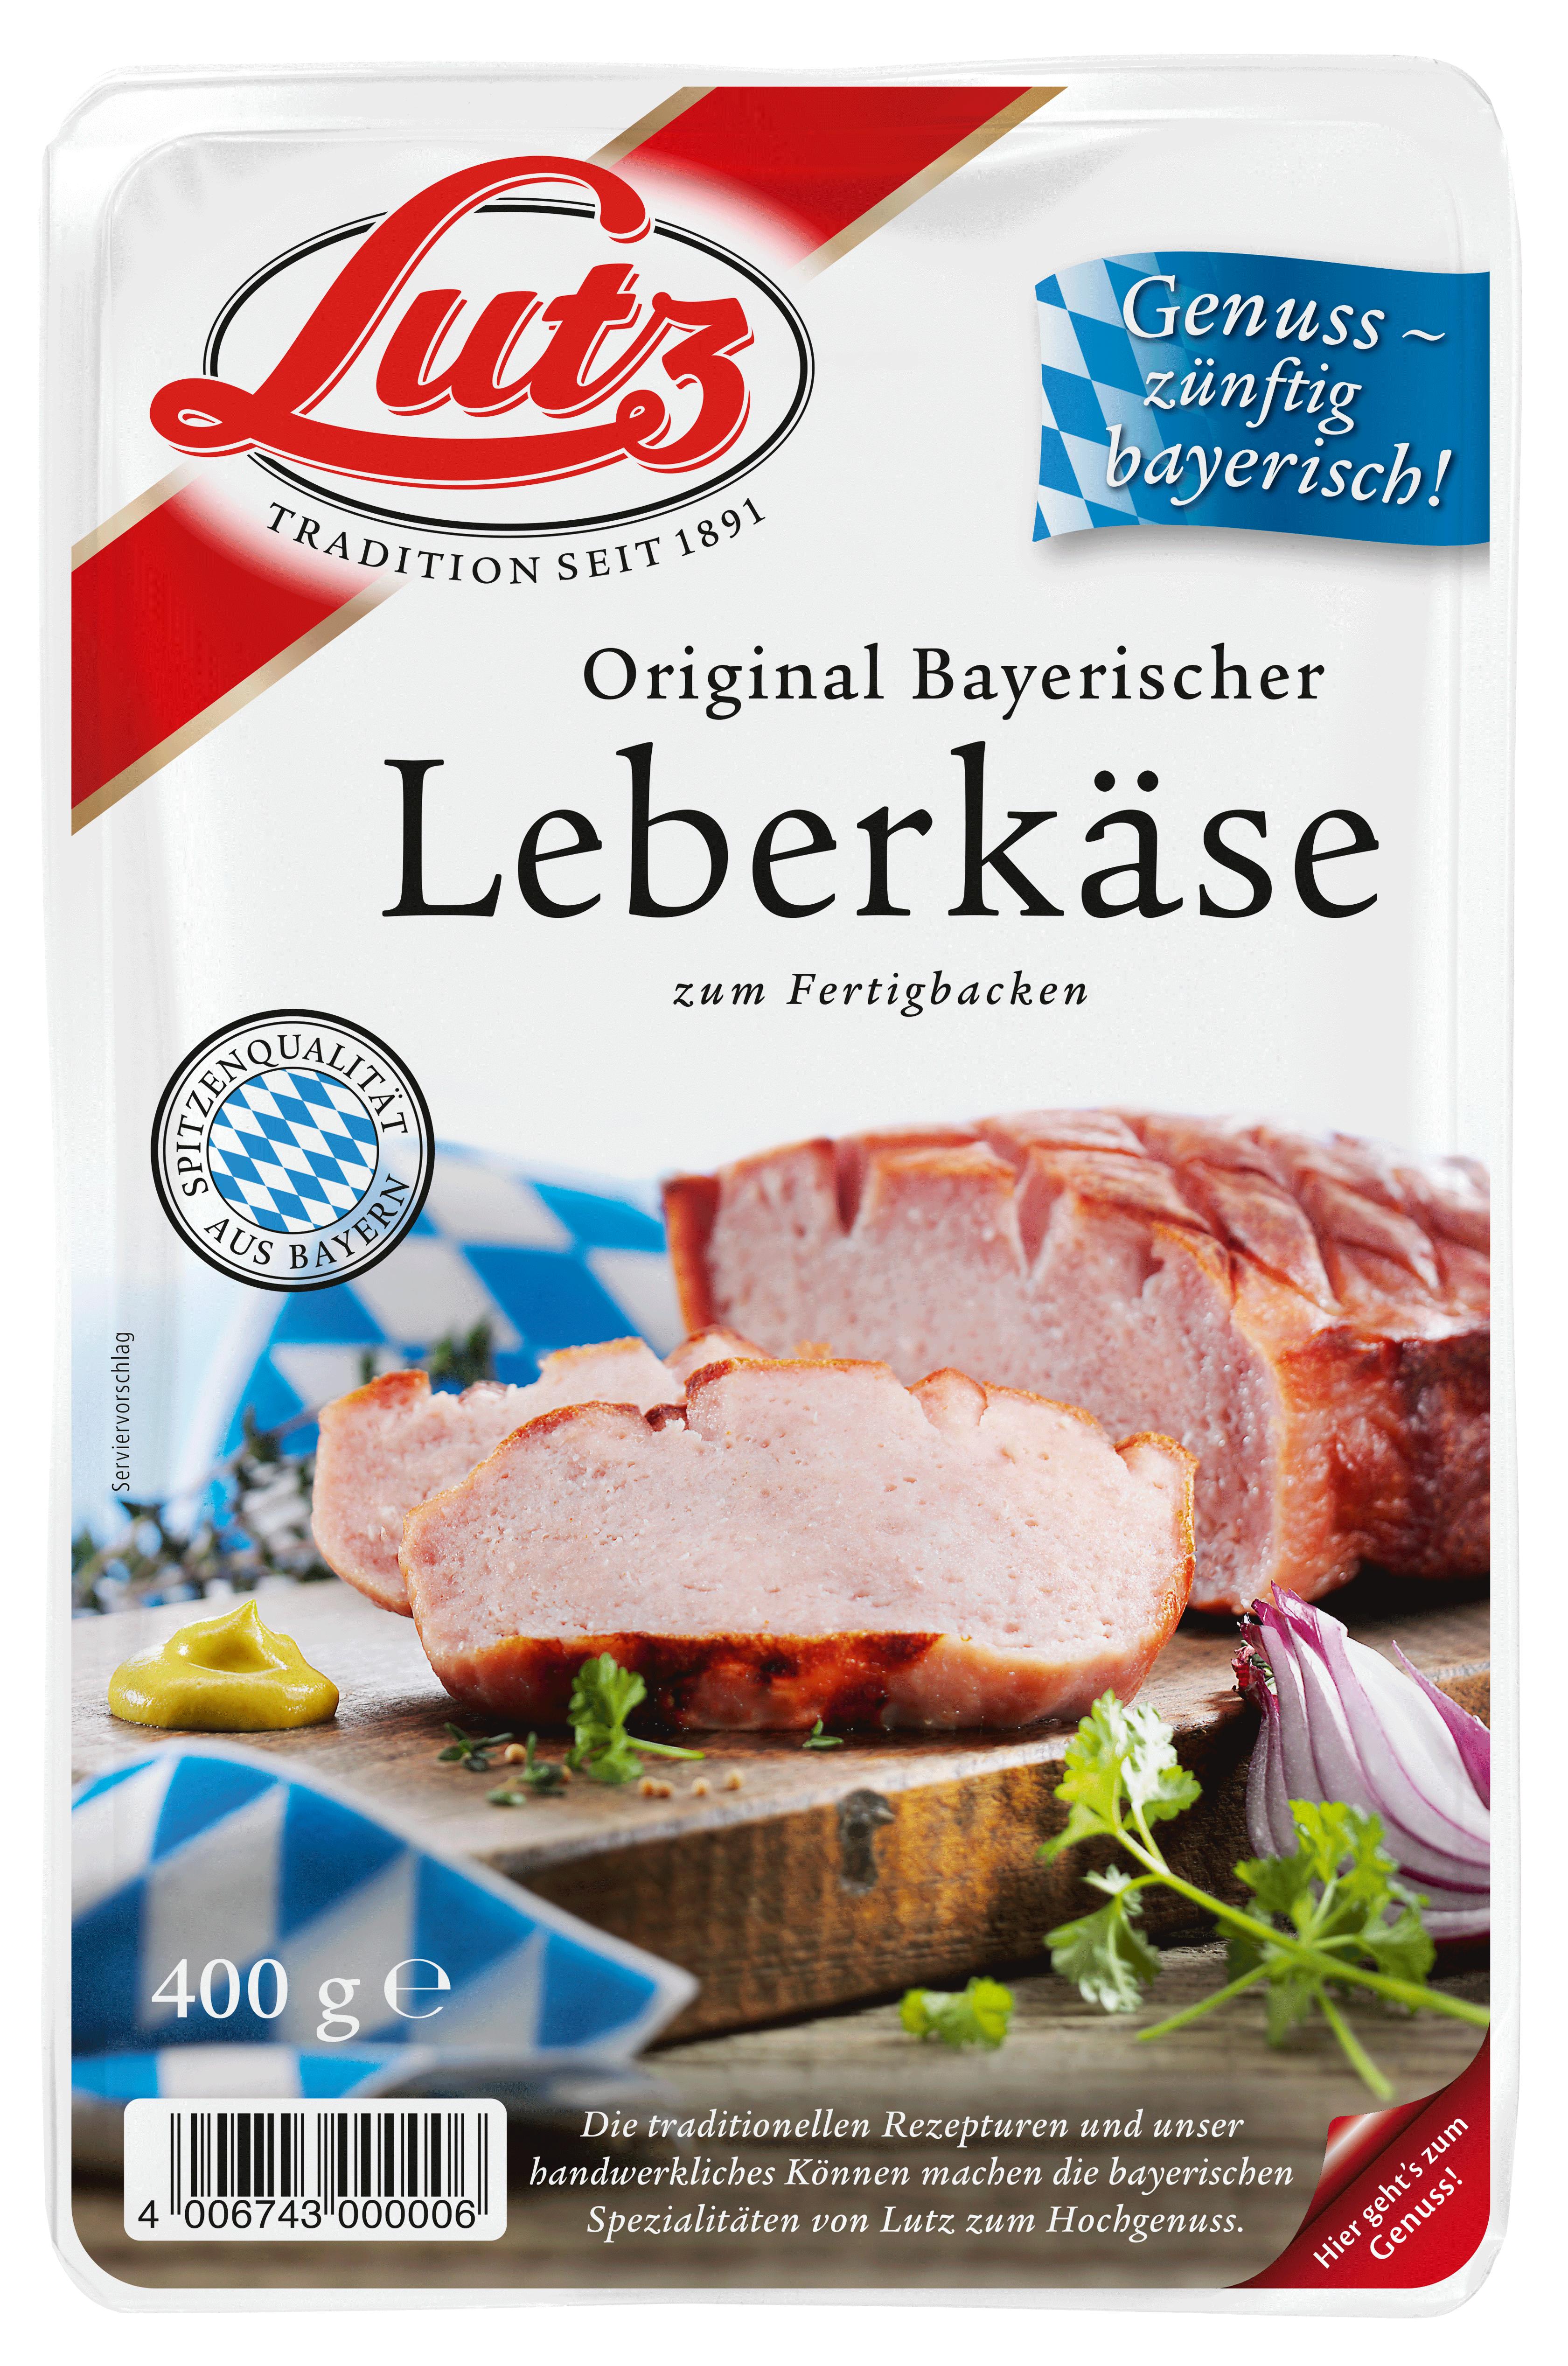 Bayerischer Leberkäse zum Fertigbacken in der Aluschale